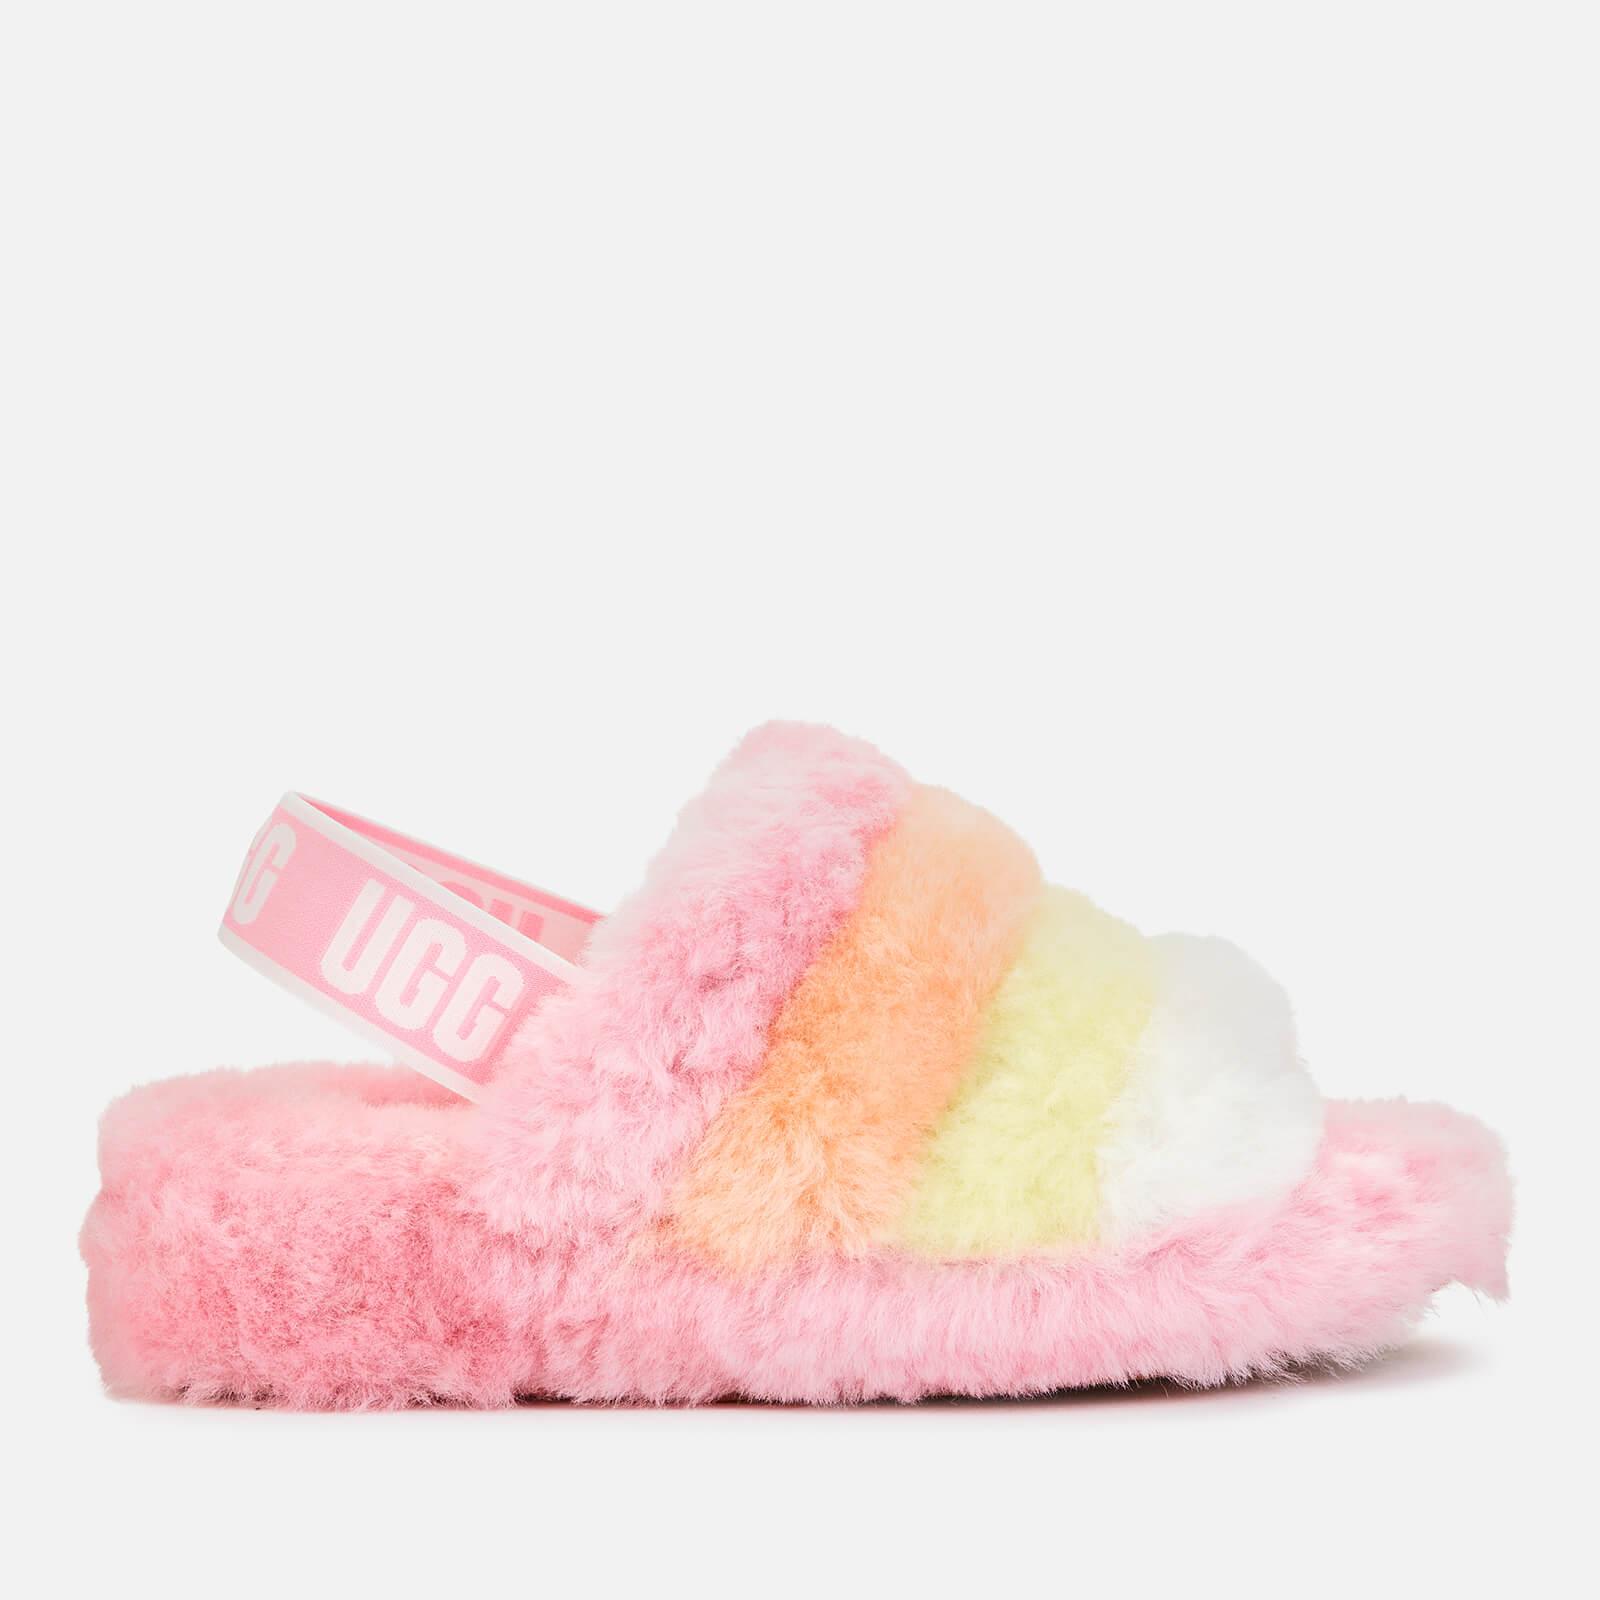 Ugg Women's Fluff Yeah Sheepskin Slippers - Sachet Pink - Uk 3